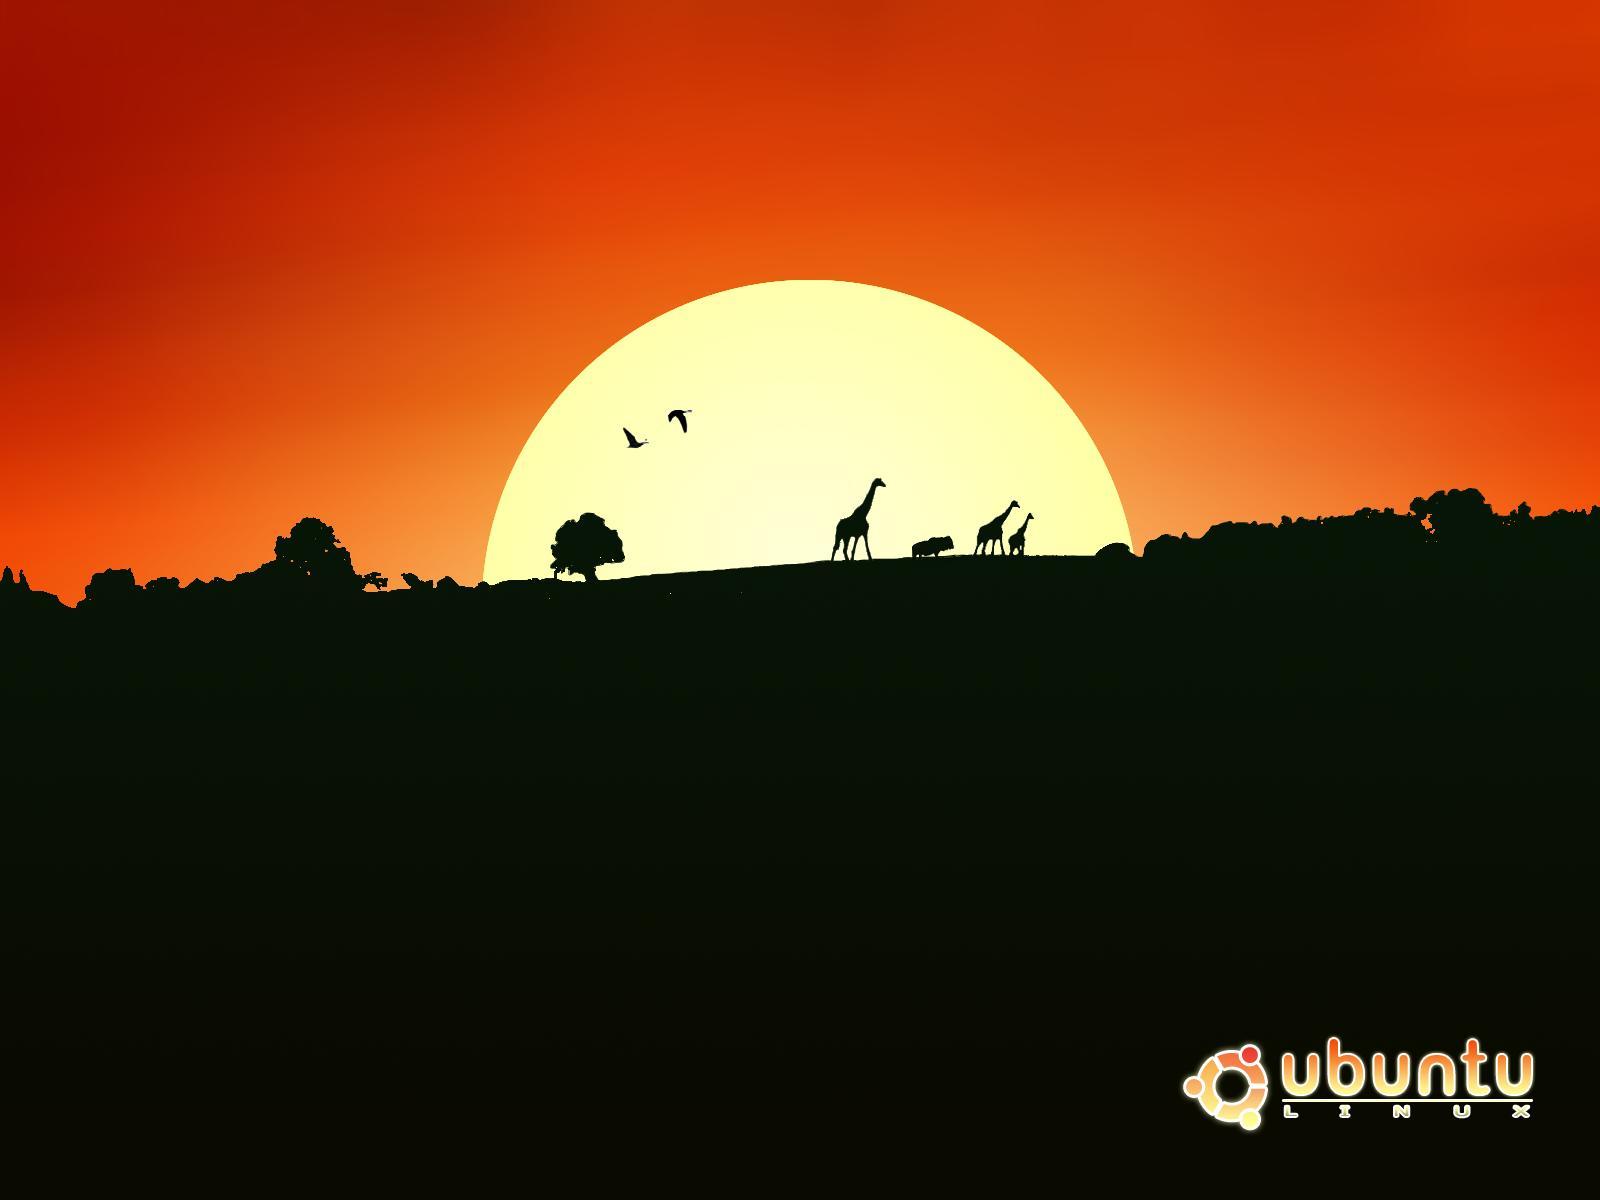 http://4.bp.blogspot.com/_W1ueYt1O3xs/RuKFHKfbjEI/AAAAAAAAA6s/MOfzwnnn9fg/s1600/back_to_the_nature_1600x1200.jpg